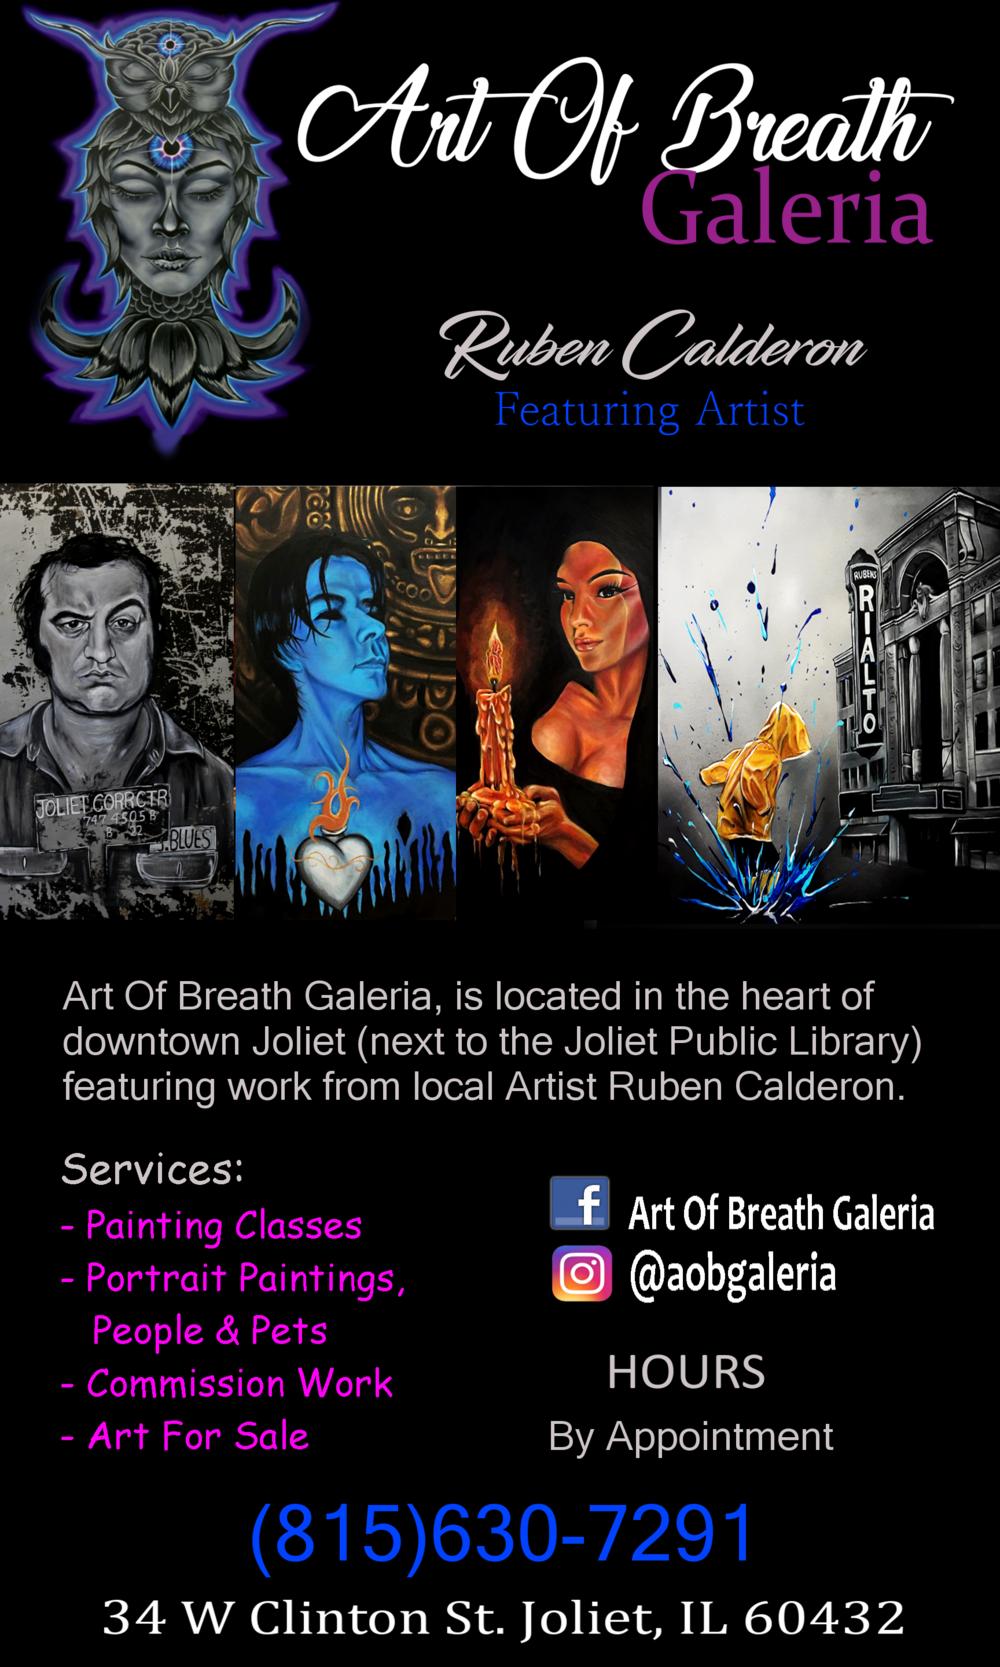 Art of Breath Galeria  in Joliet, IL.